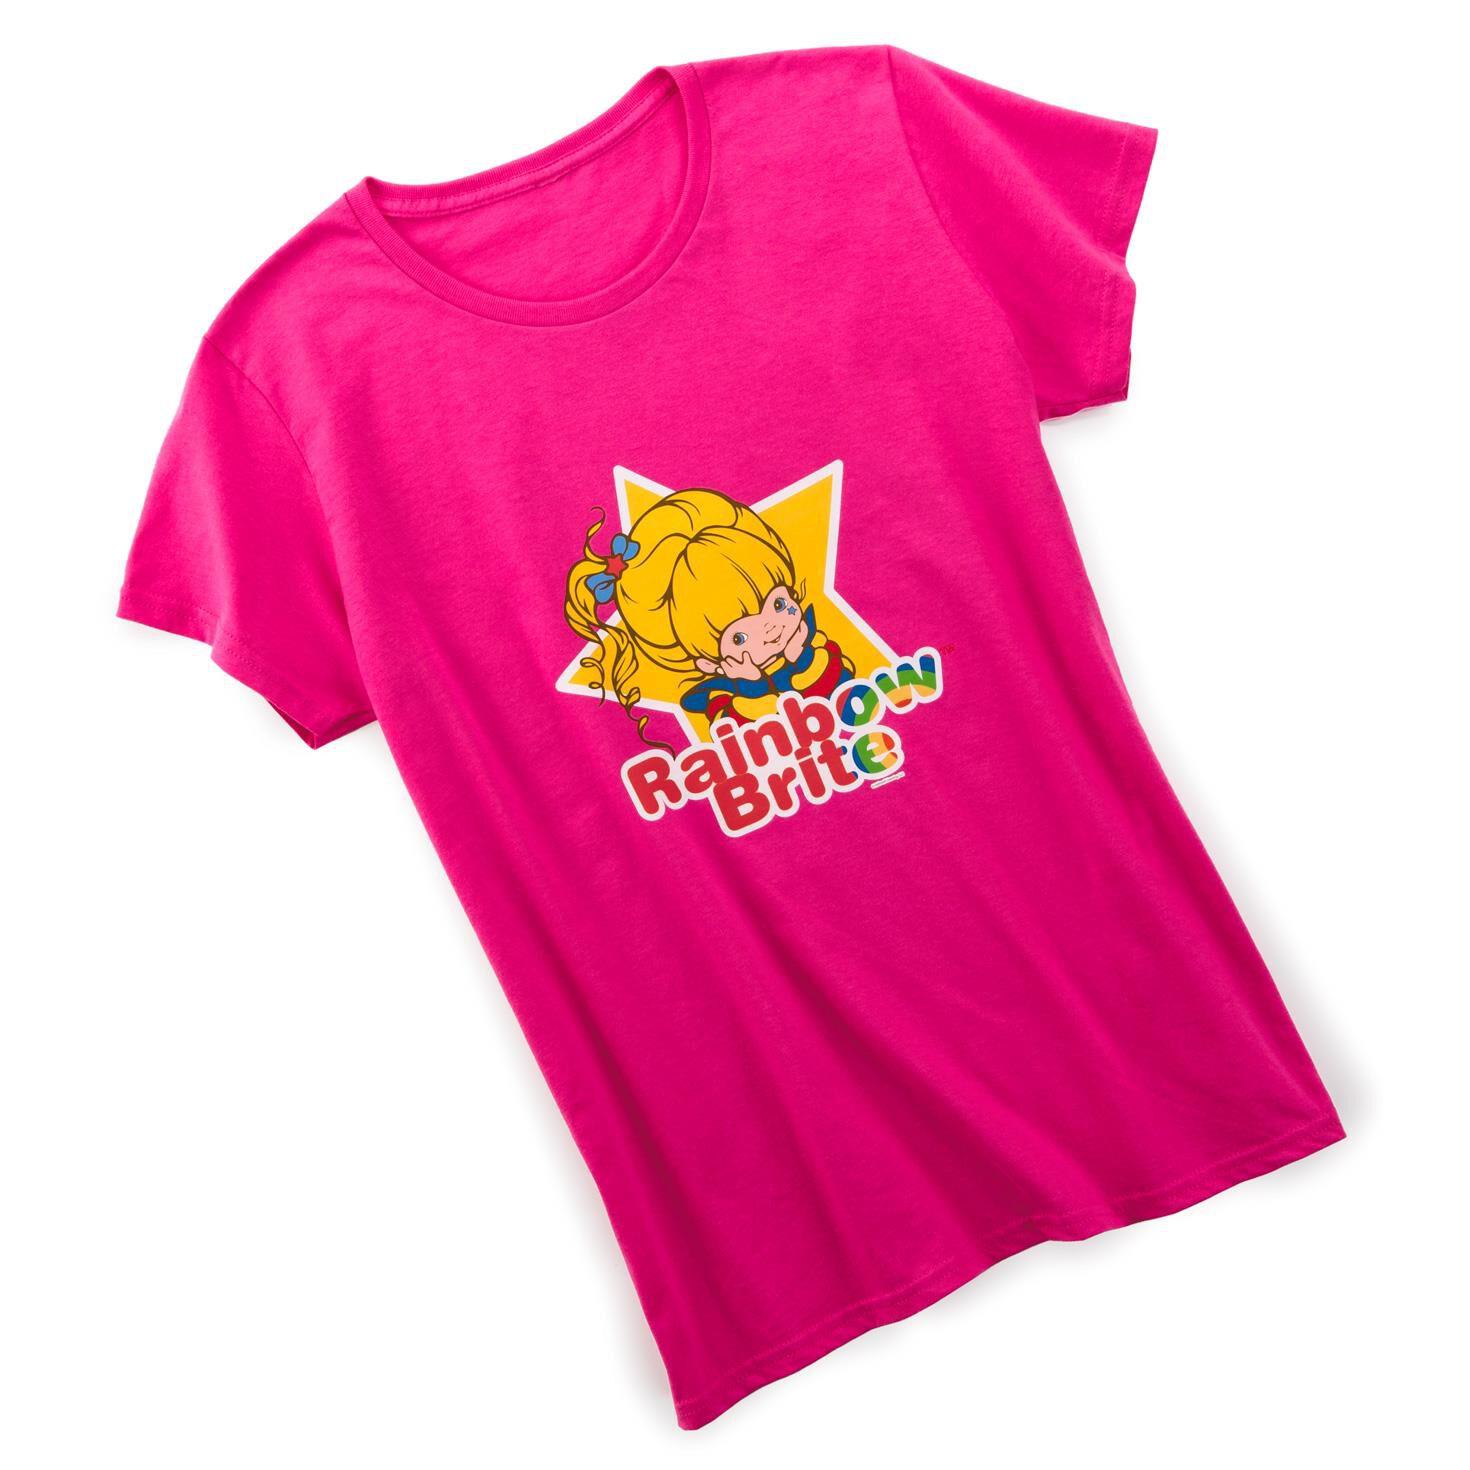 Rainbow Brite™ Women's Fitted Hot Pink T-Shirt - T-shirts - Hallmark